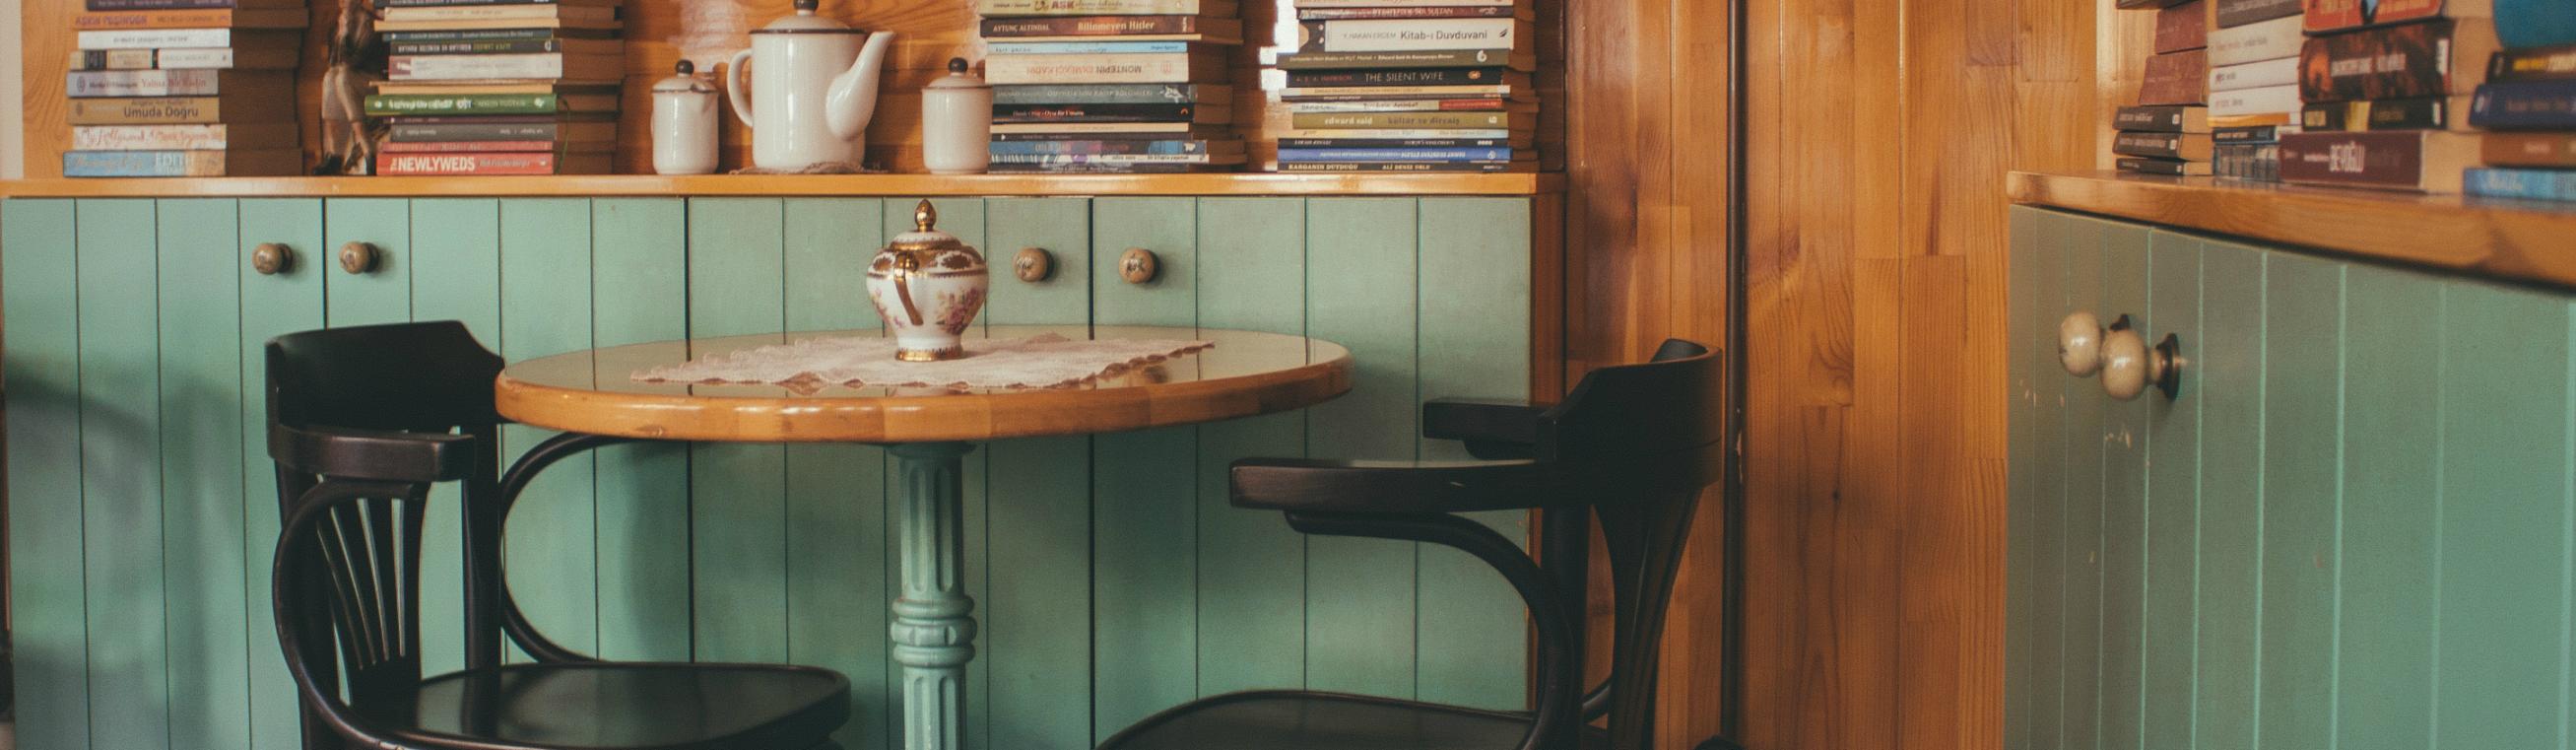 Jill's Book Cafe